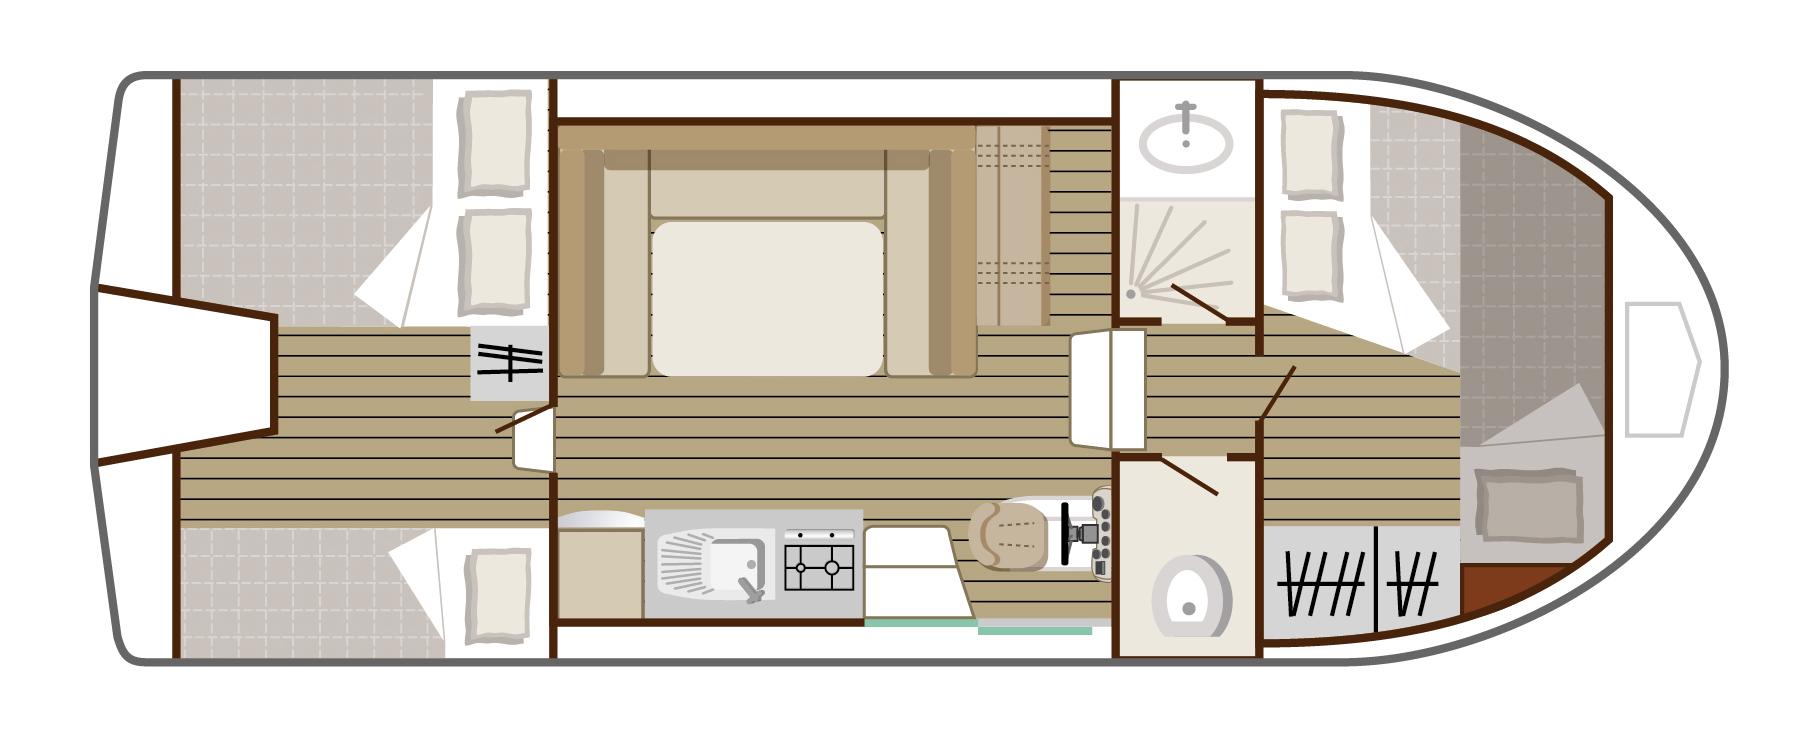 Plan Nicols Riviera 920, intercroisieres